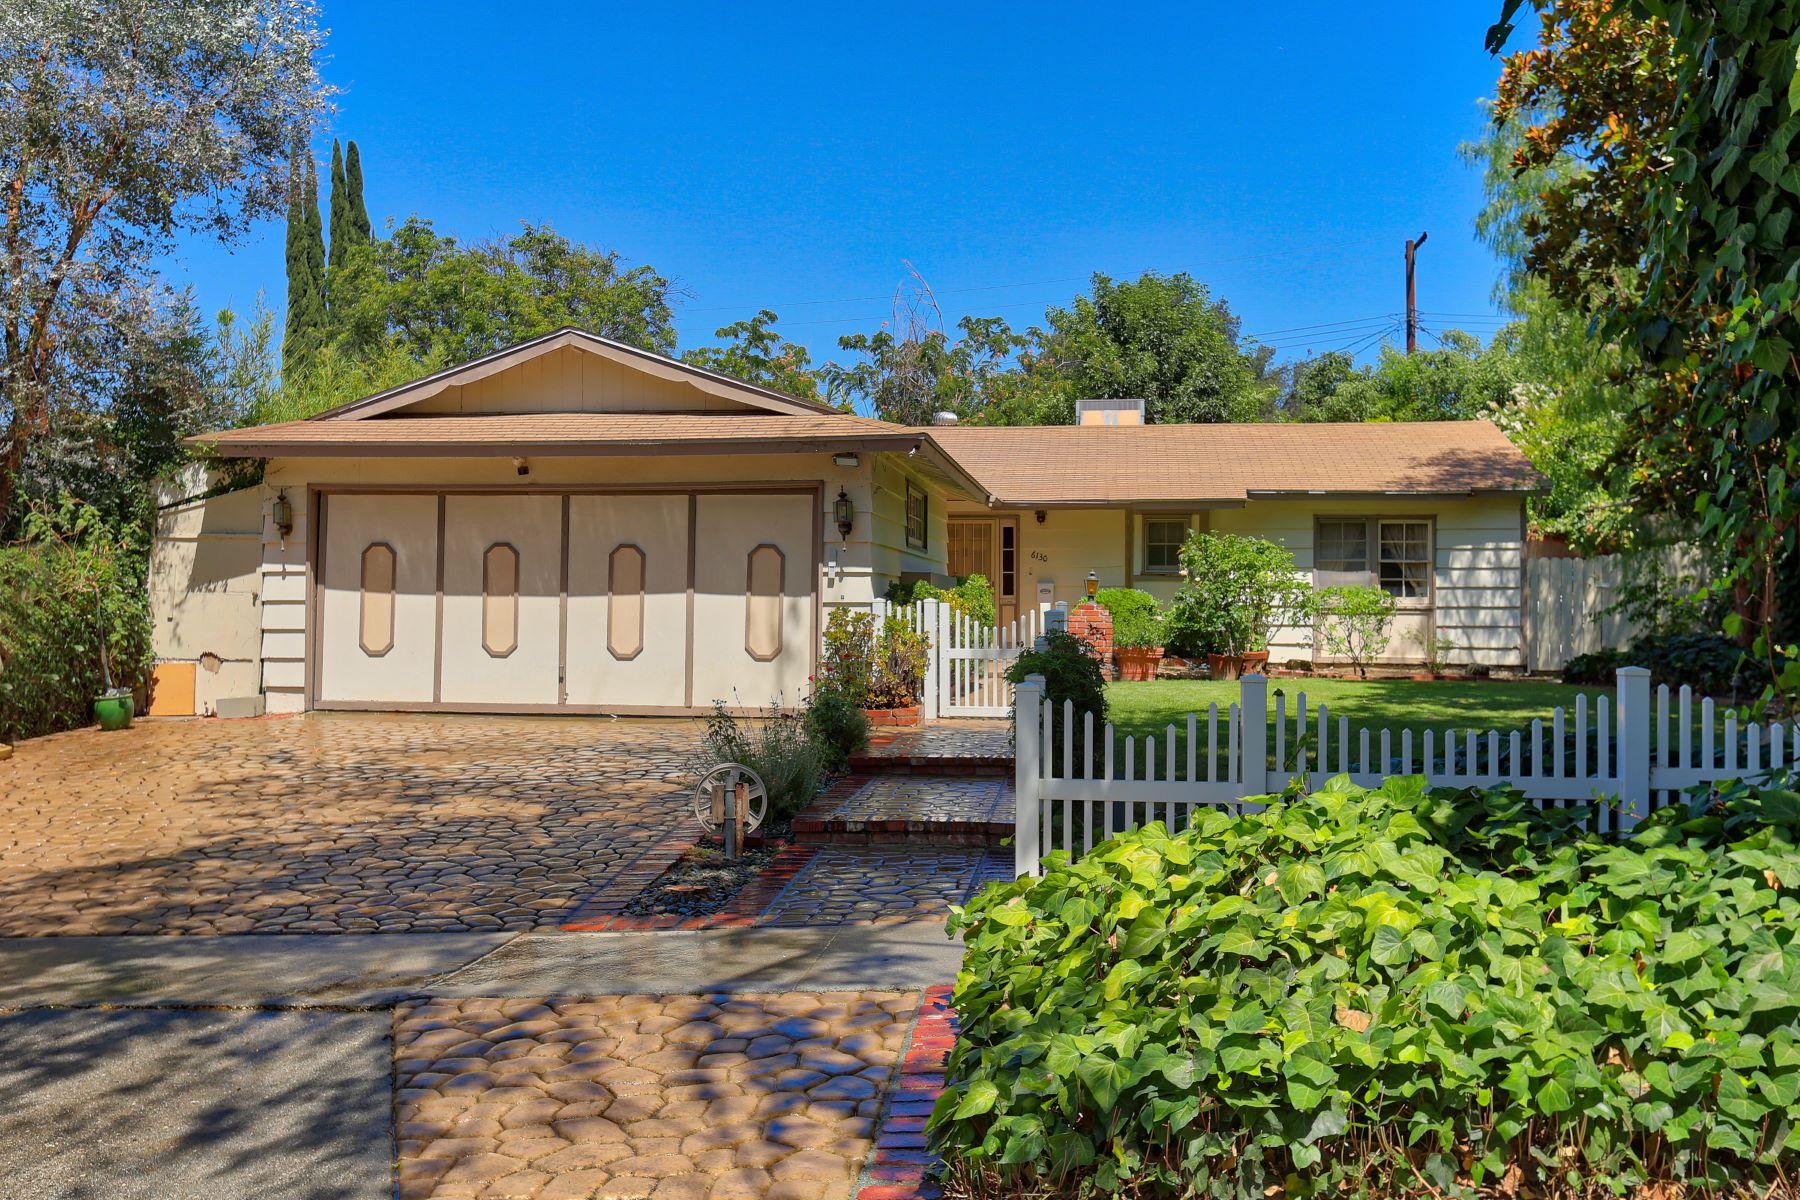 Single Family Home for Sale at 6130 Lederer Avenue Woodland Hills, California, 91367 United States